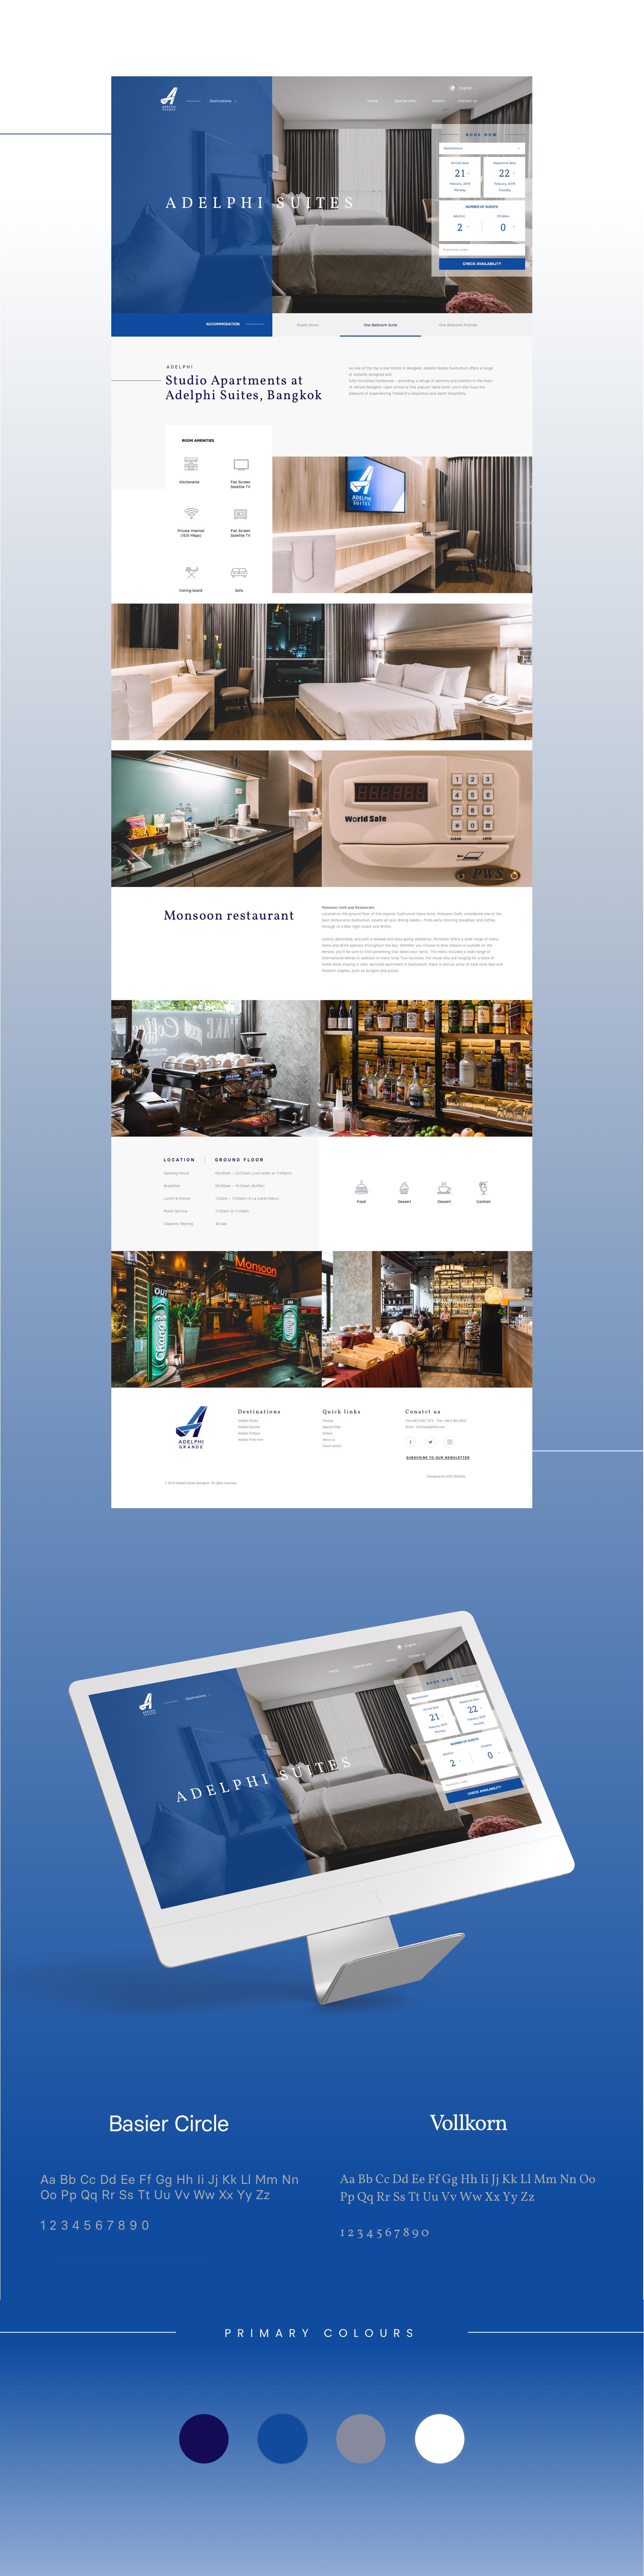 KOS Design - Adelphi